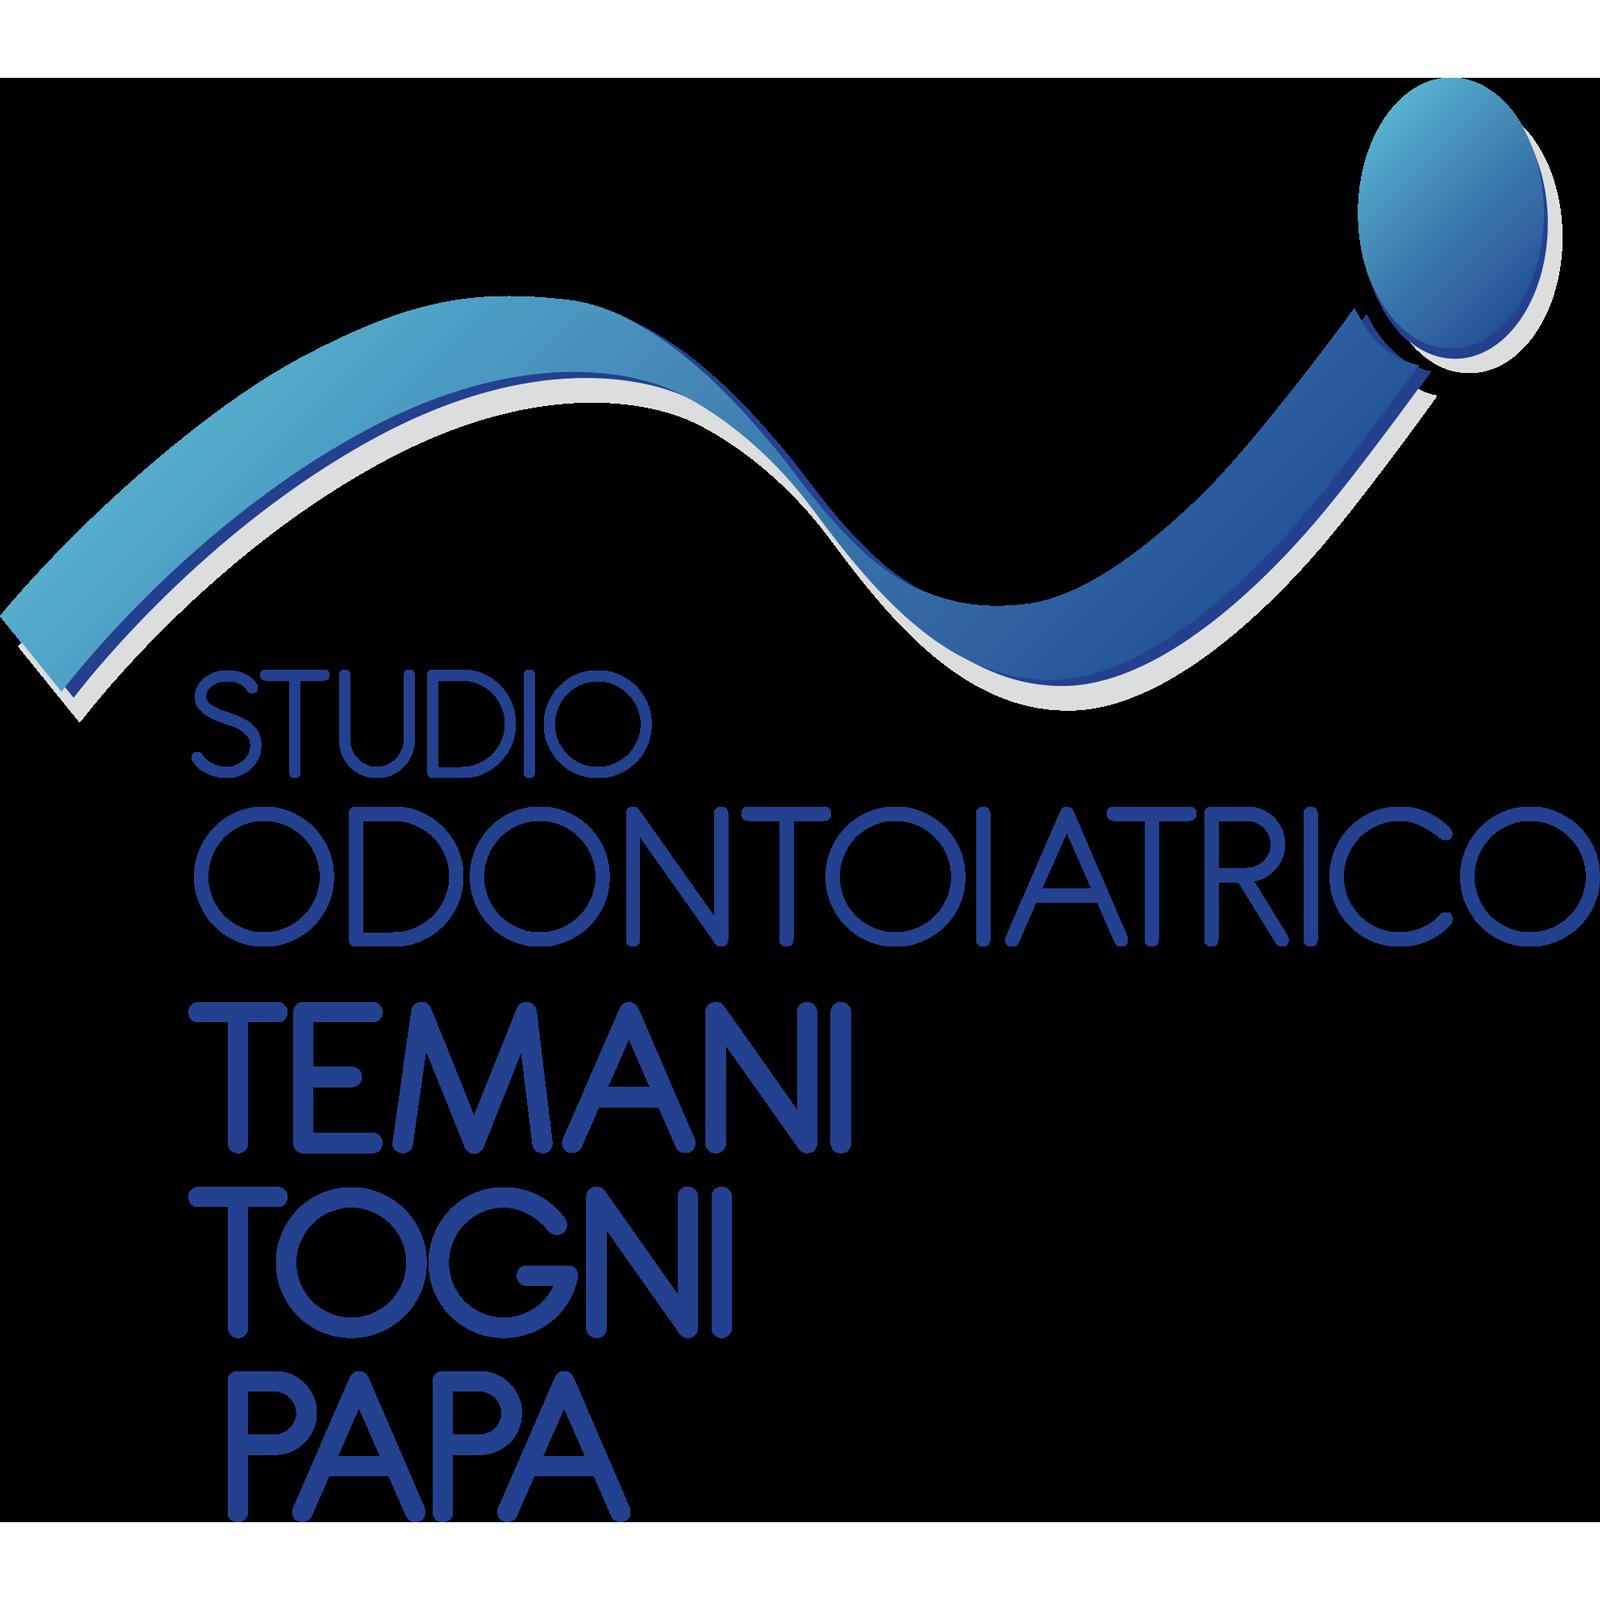 STUDIO TEMANI dei Dottori Simone Togni e Papa Sergio